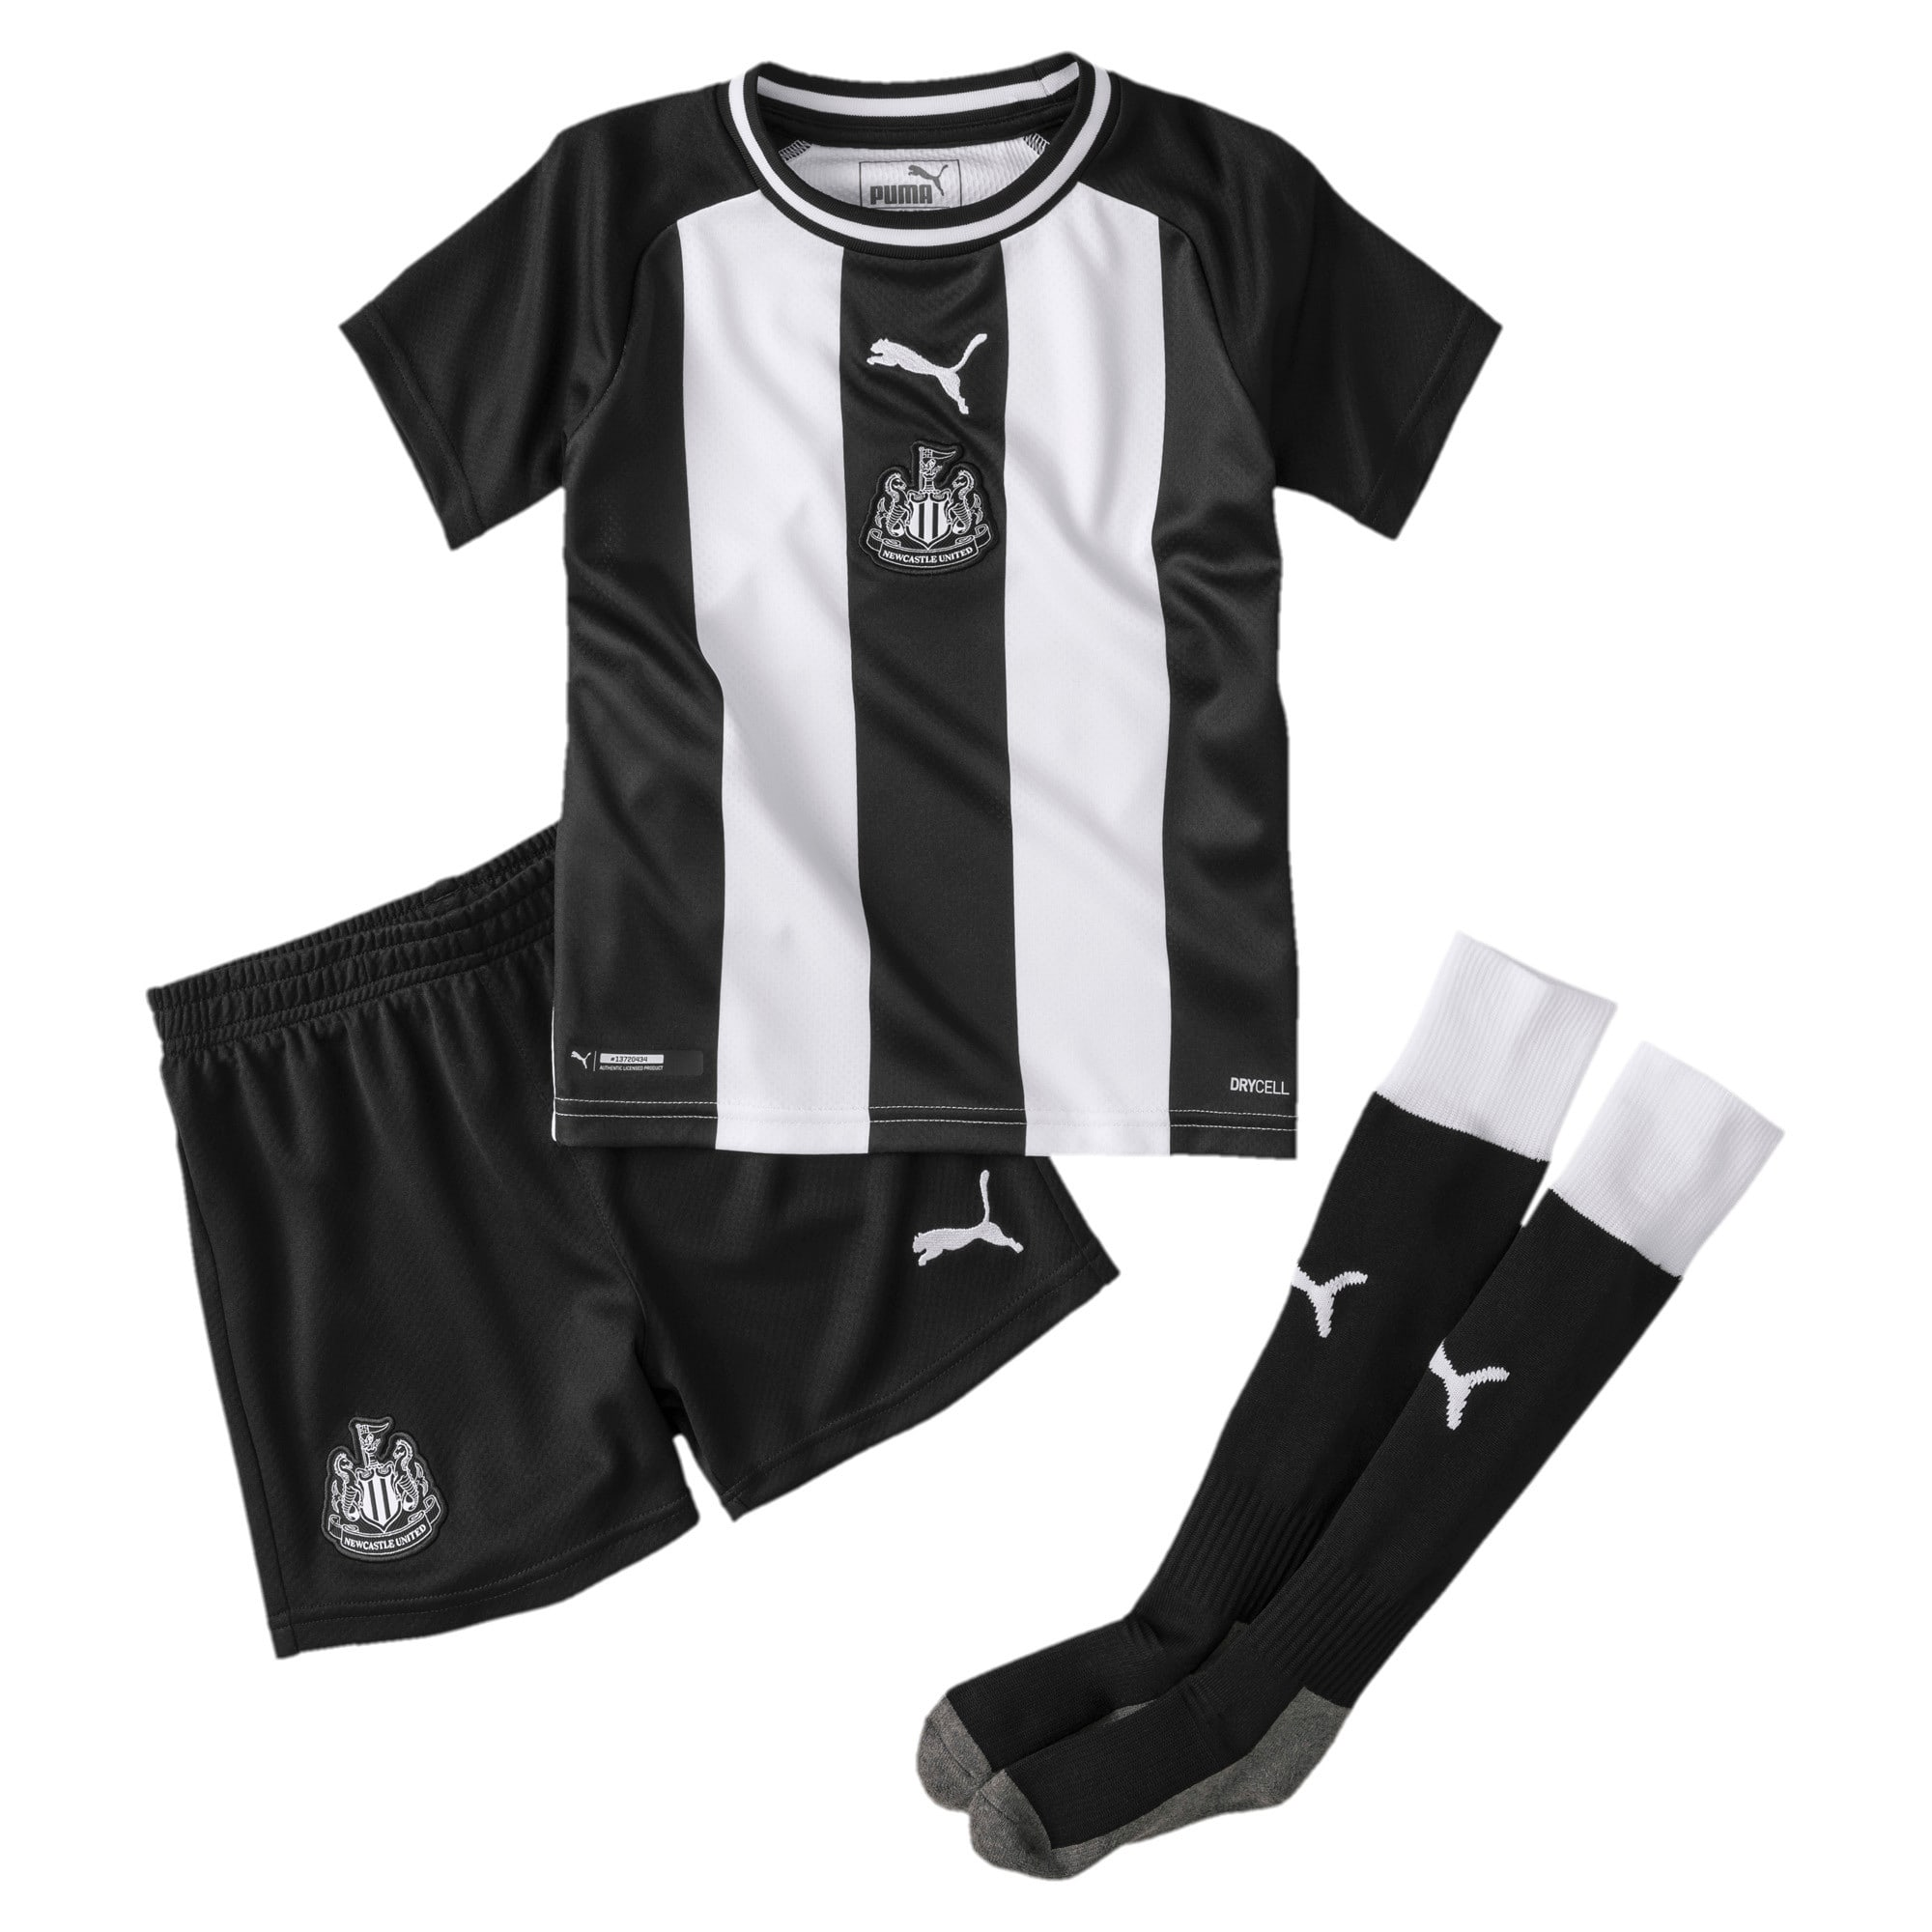 Thumbnail 1 of Newcastle United Kids' Home Mini Kit, Puma White-Puma Black, medium